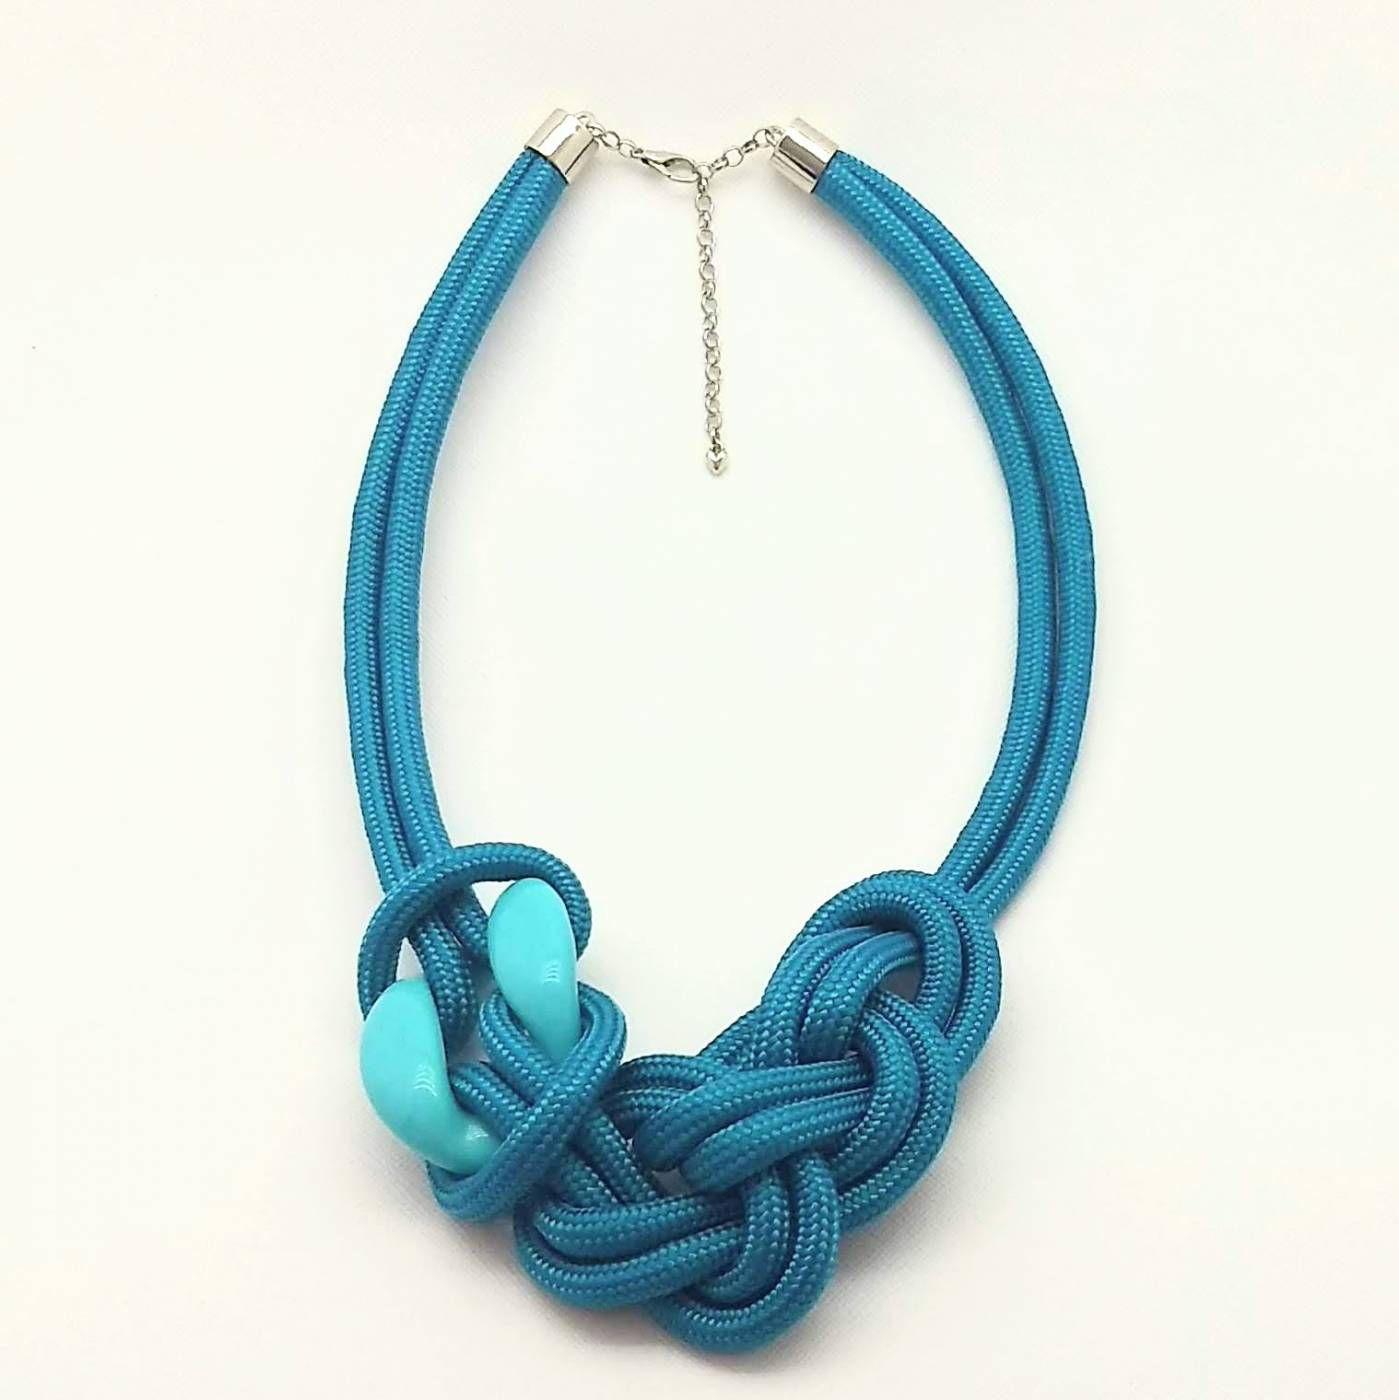 Colar Florence em Corda Azul Turquesa Tradicional